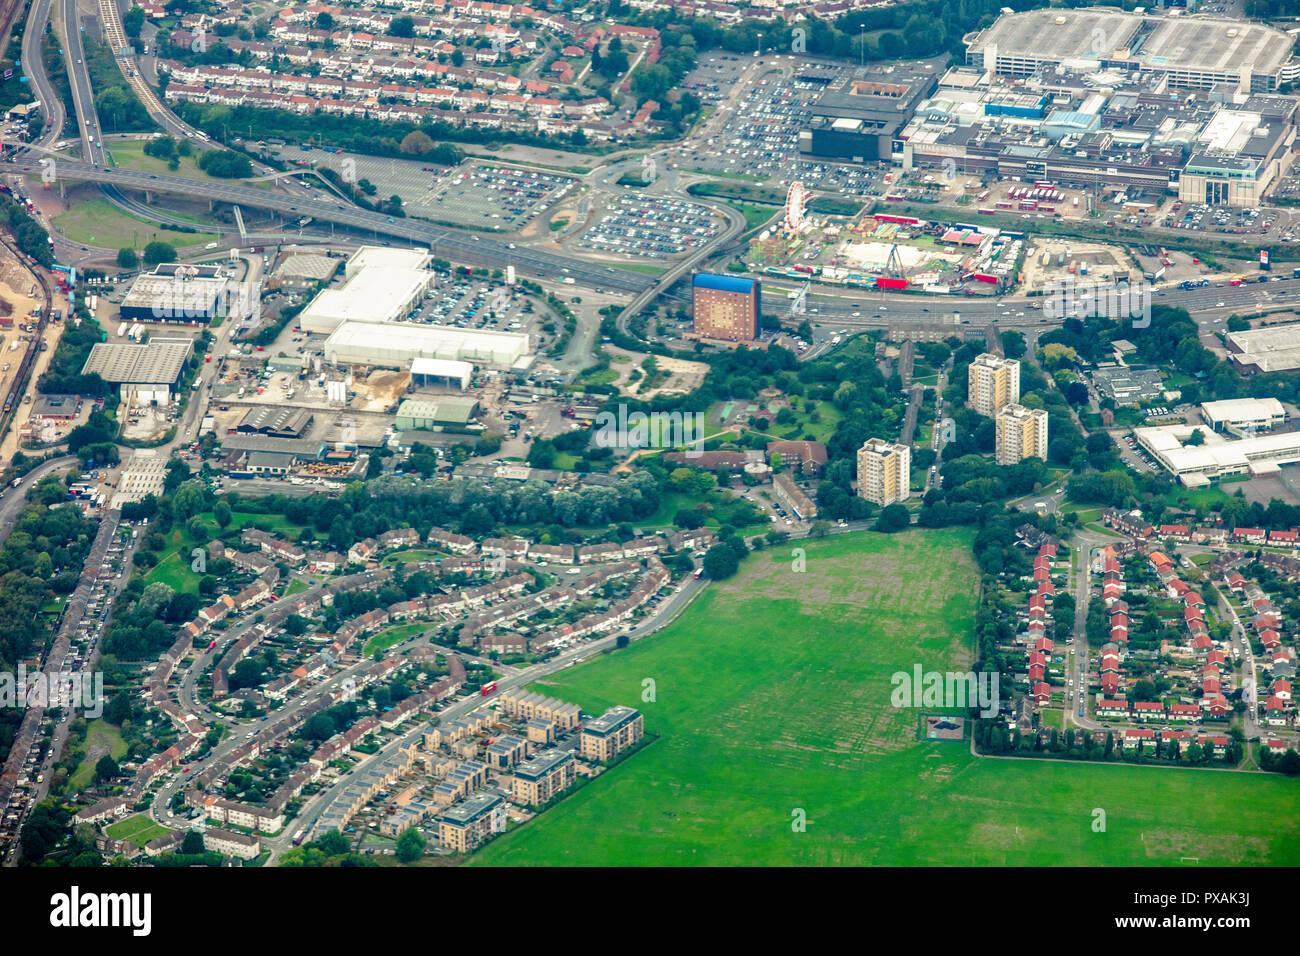 London, UK - September 04 2018: High altitude aerial view of Brent Cross urban neighbourhood featuring Cricklewood & Hendon Station, Brent Reservoir - Stock Image